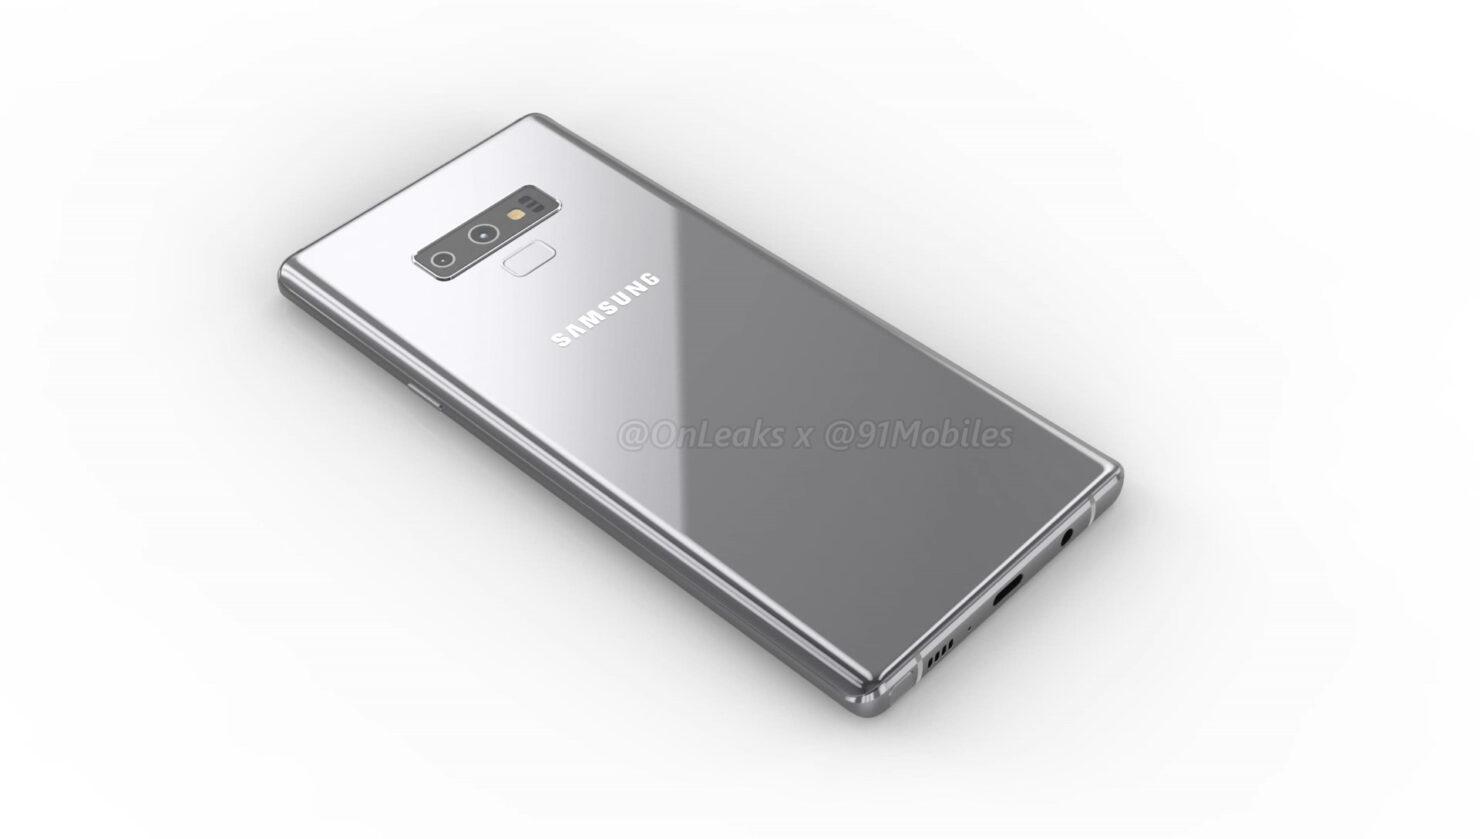 samsung-galaxy-note-9-render-91mobiles-6